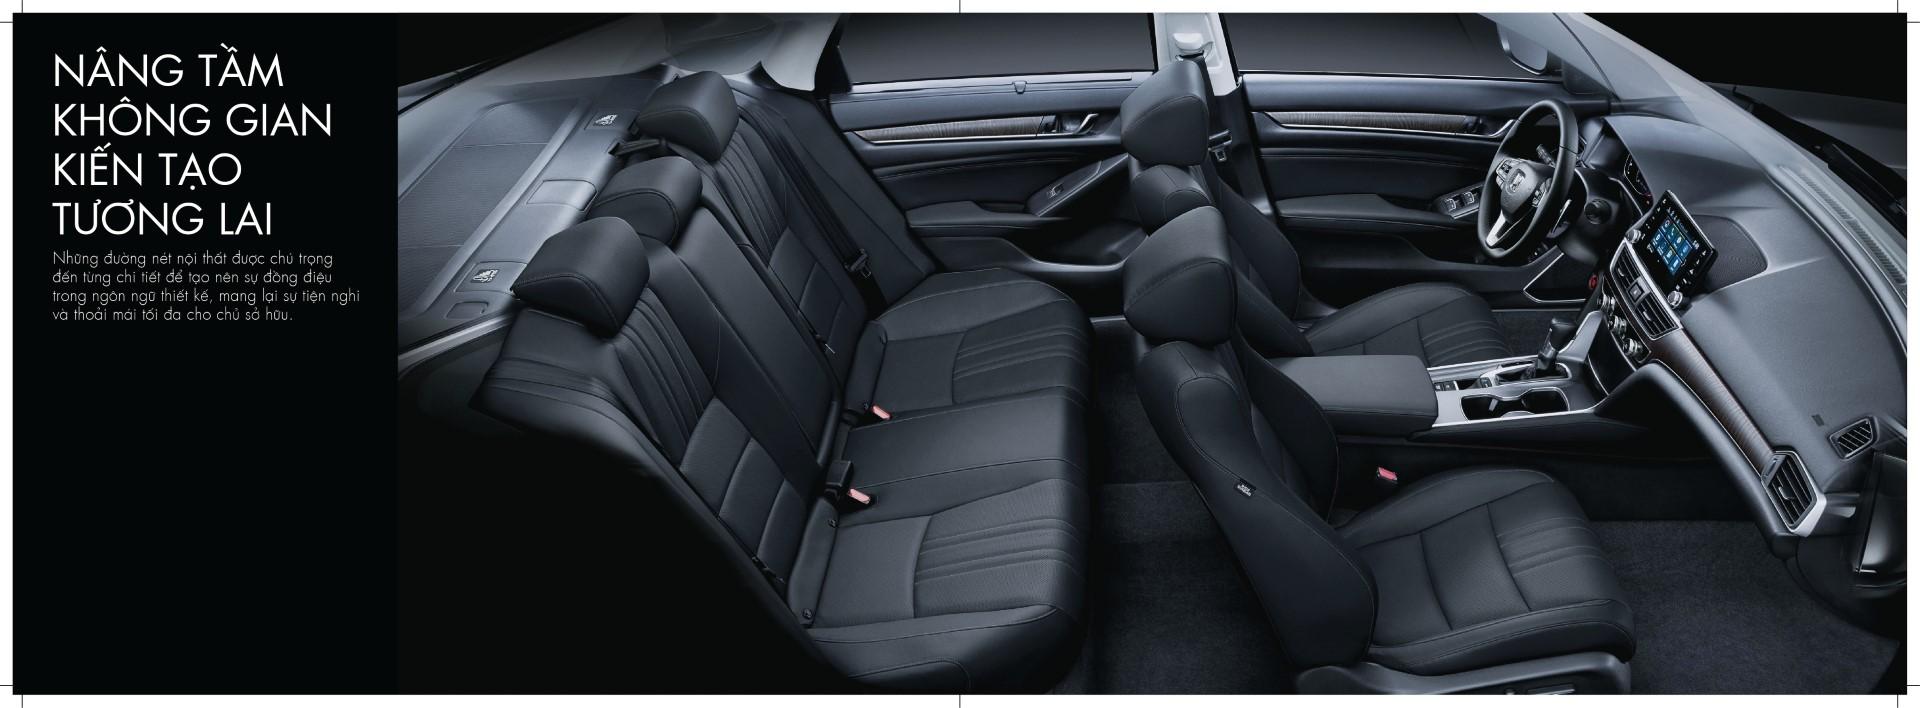 car-detail-accord-04_large